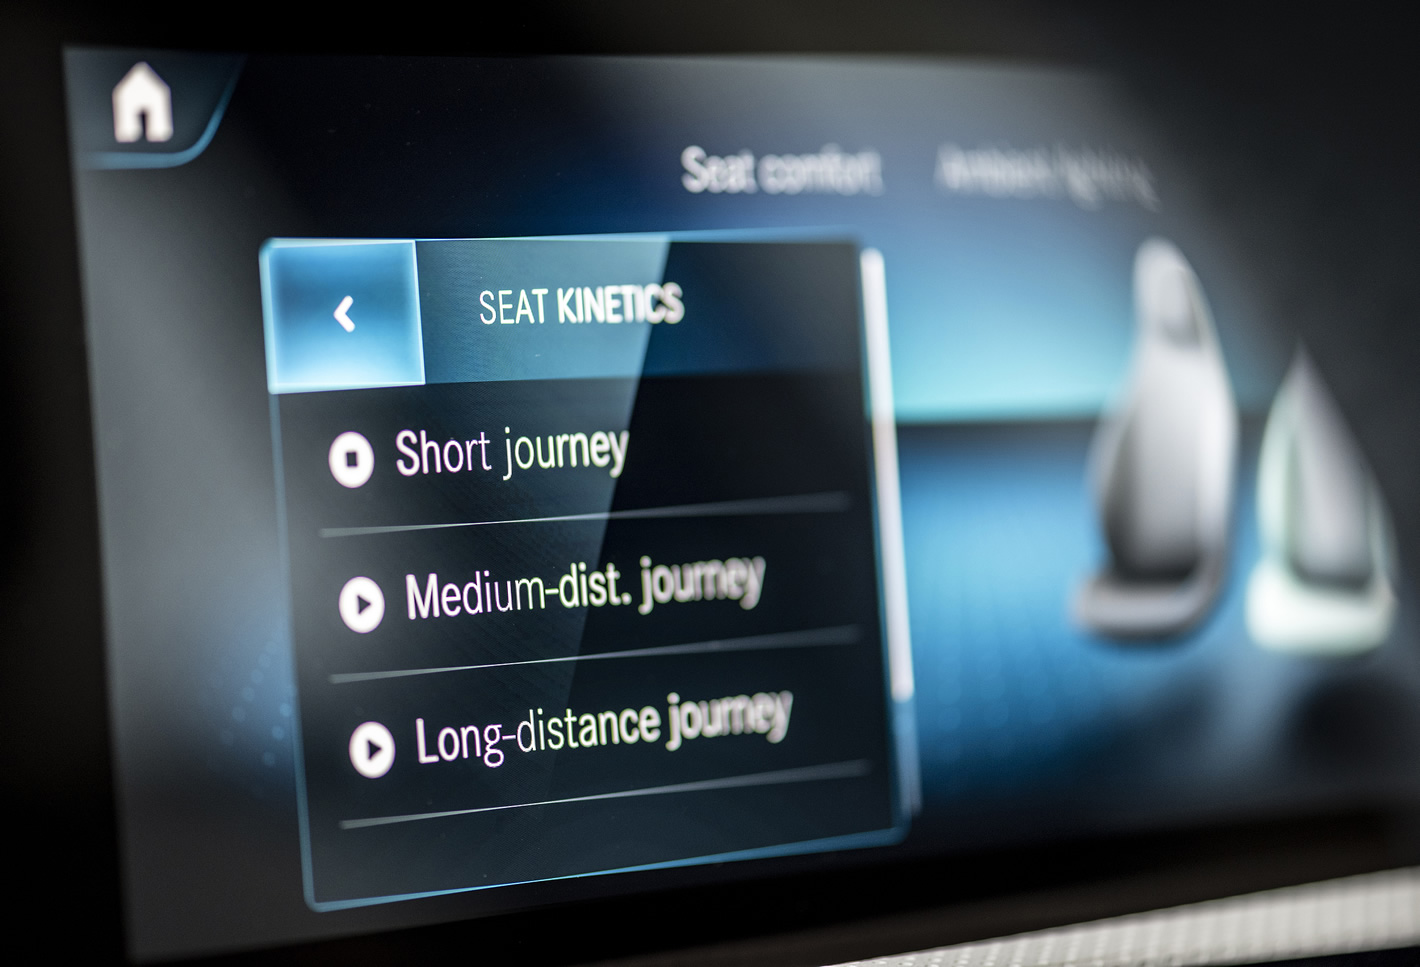 Mercedes-Benz Klasy A 200 - kinetyka foteli